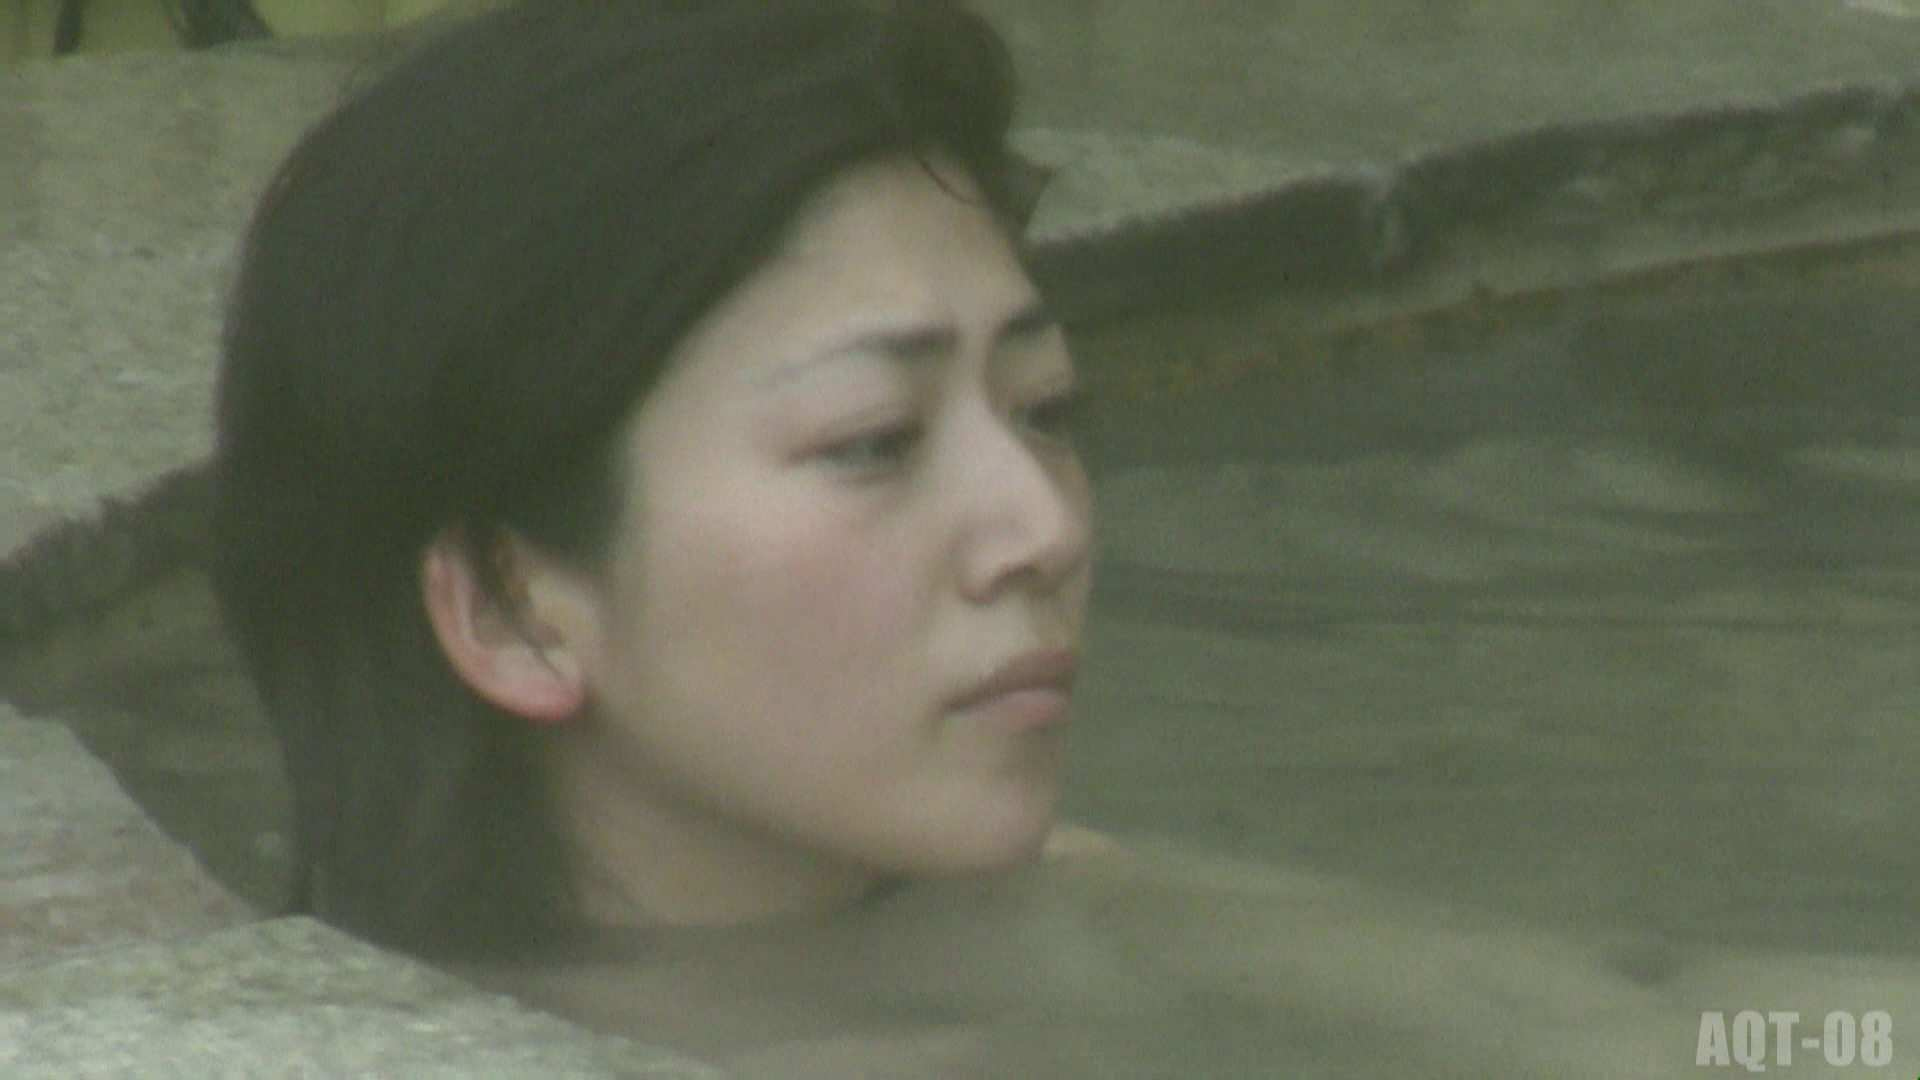 Aquaな露天風呂Vol.776 盗撮 エロ無料画像 108画像 38